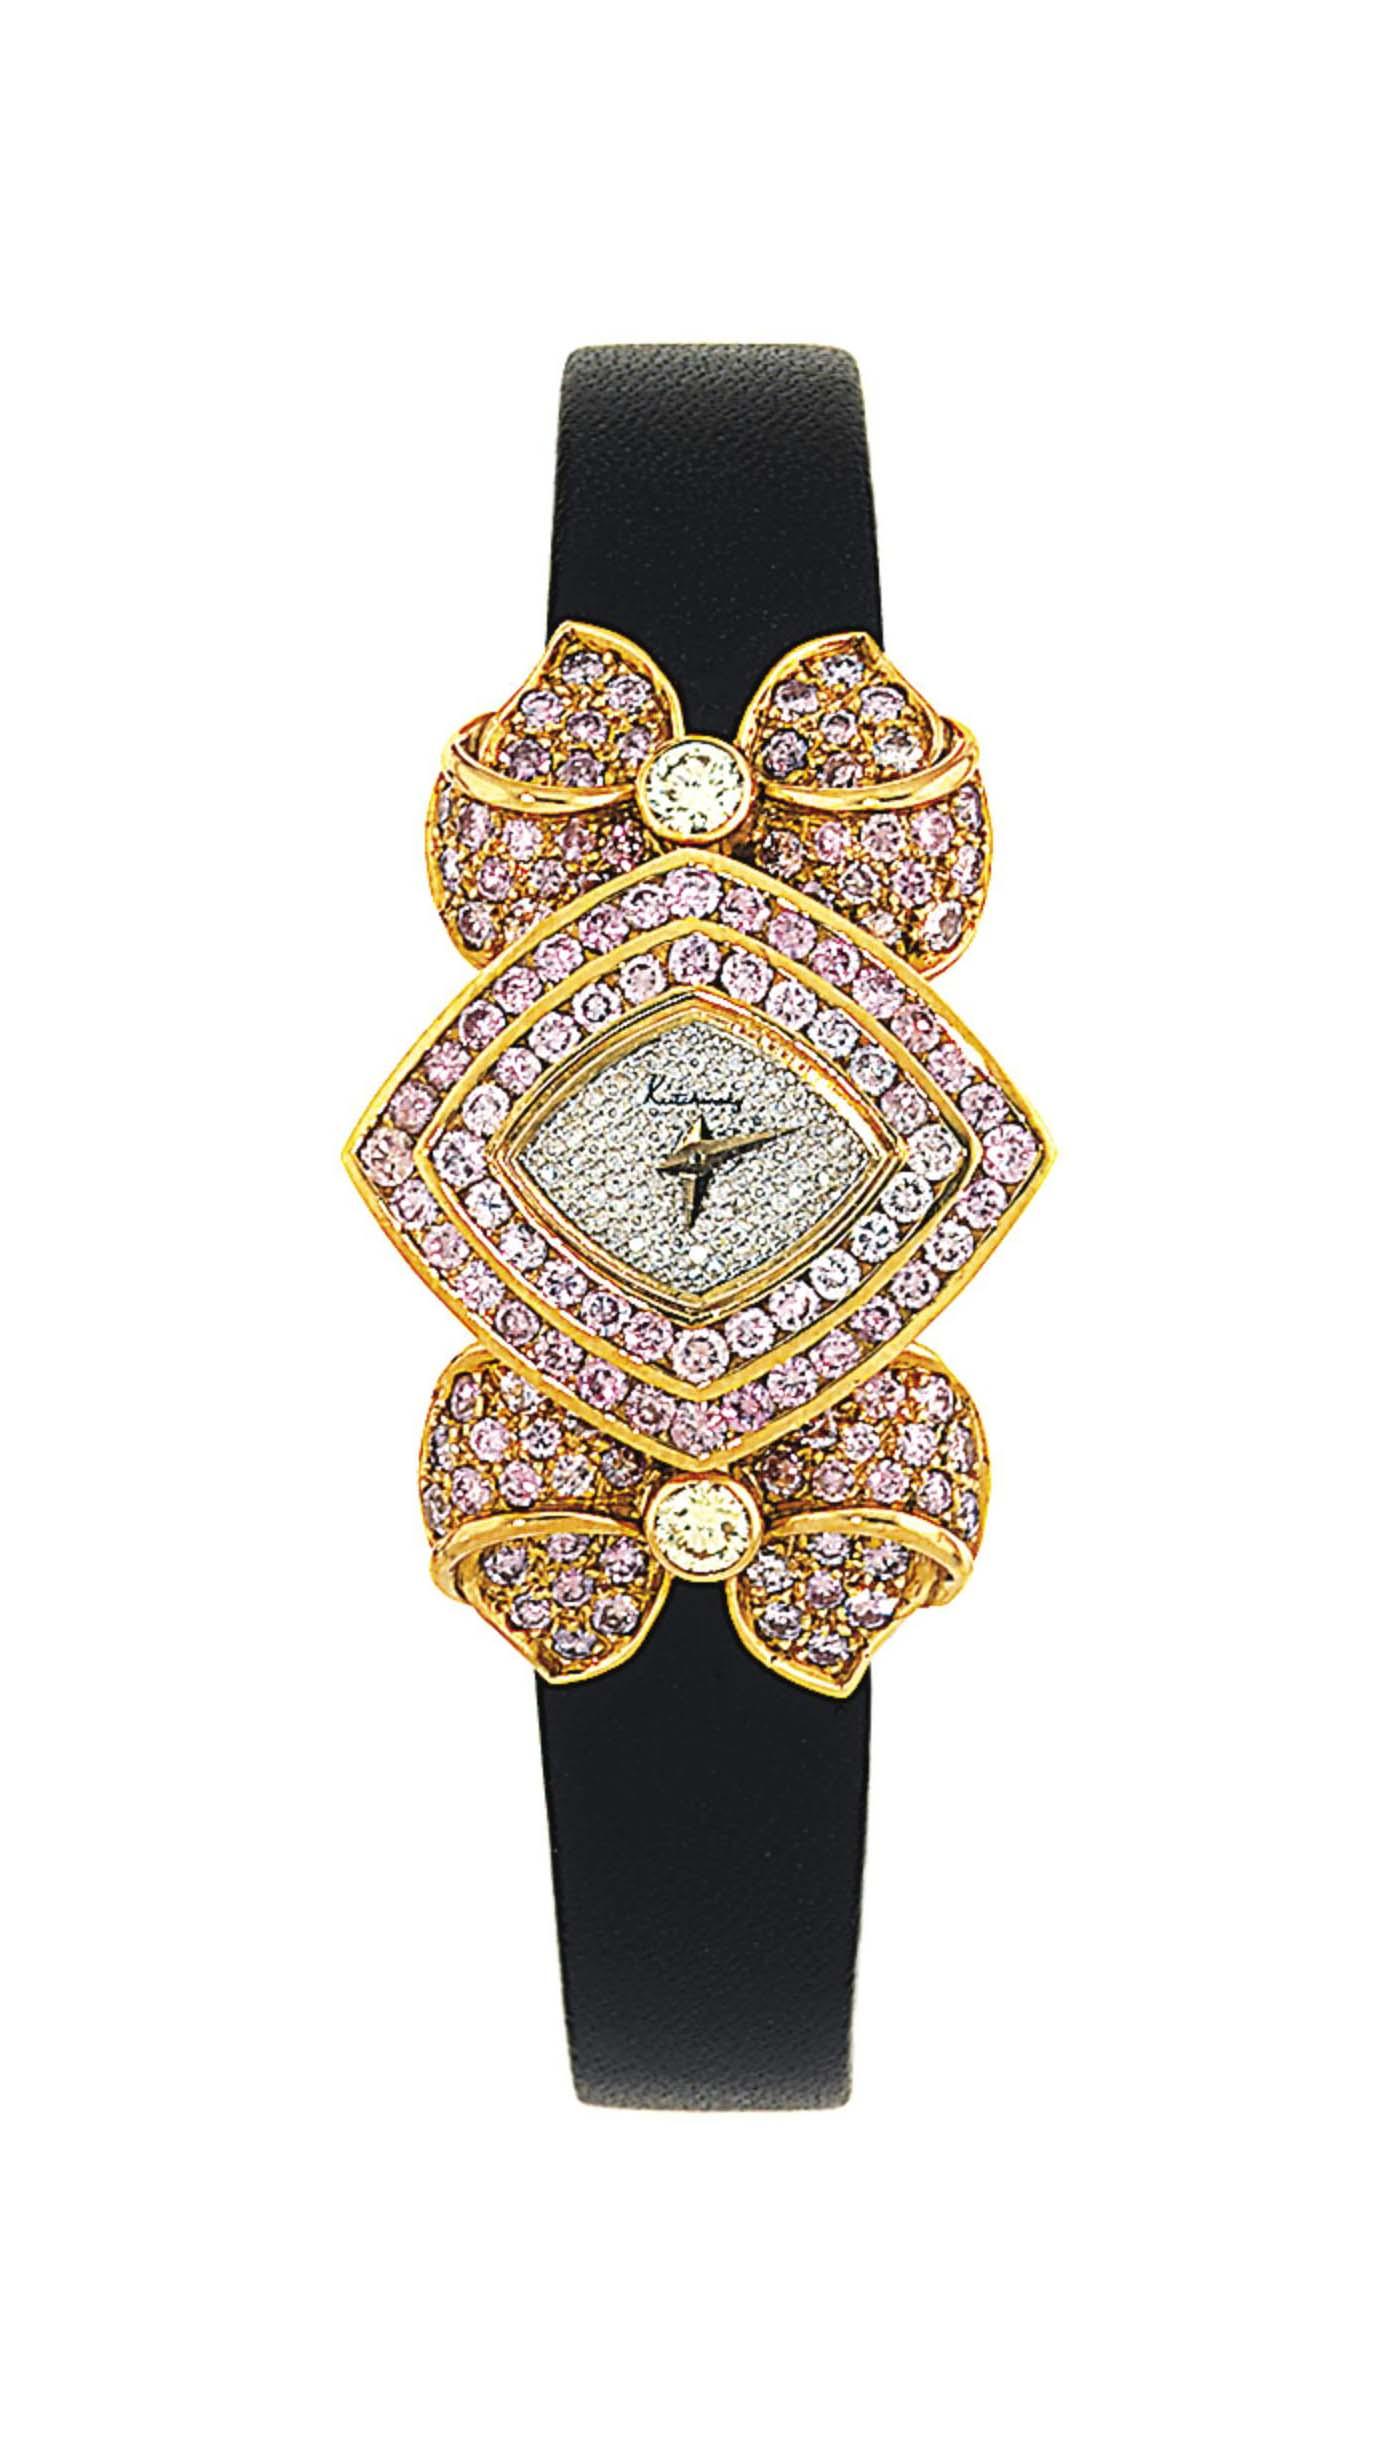 An 18ct gold diamond and coloured diamond quartz wristwatch, by Kutchinsky